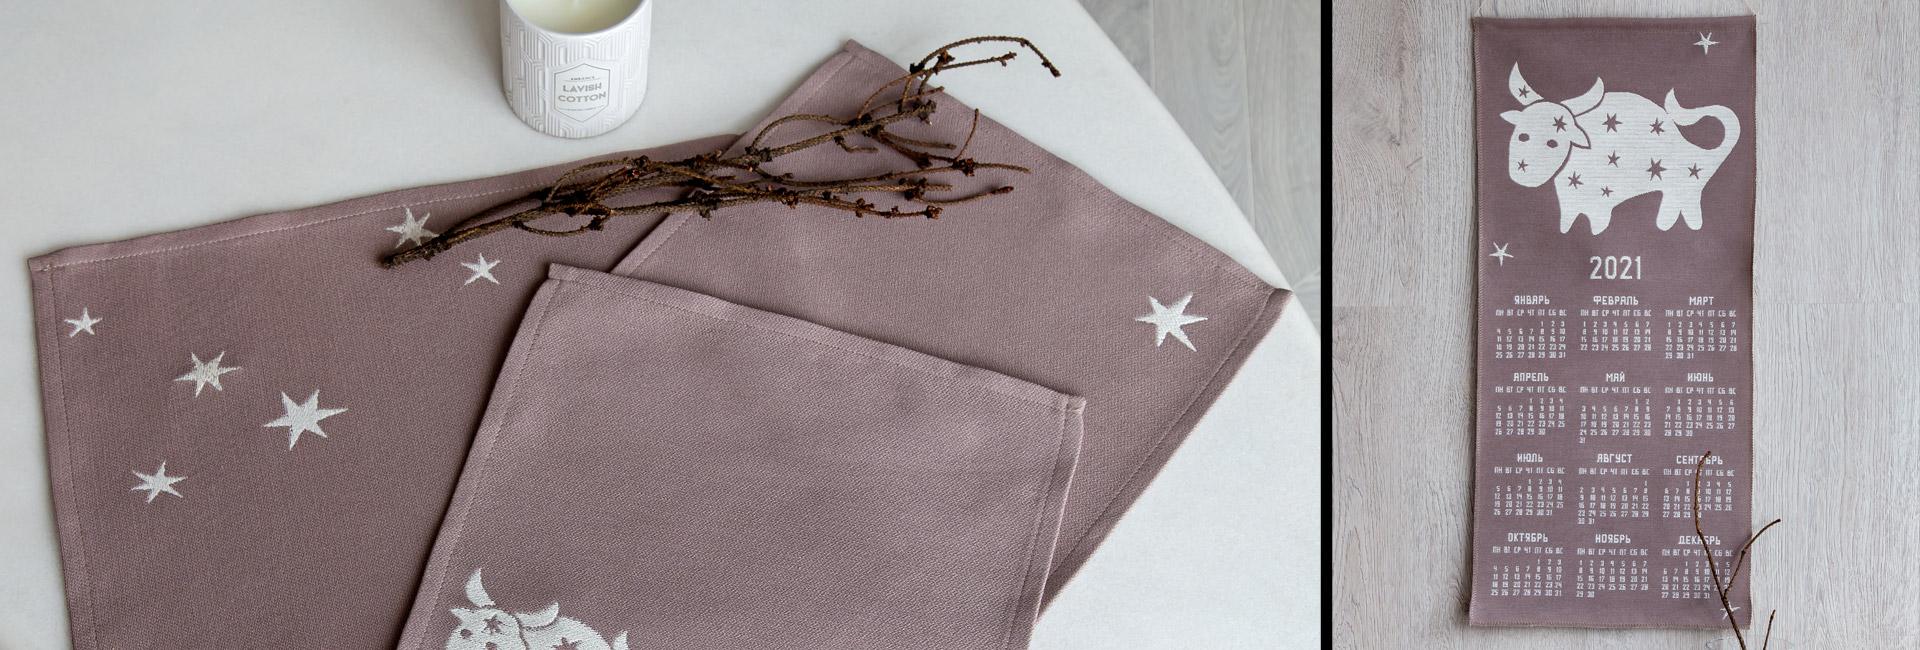 Календарь и салфетки «Звездный бык»